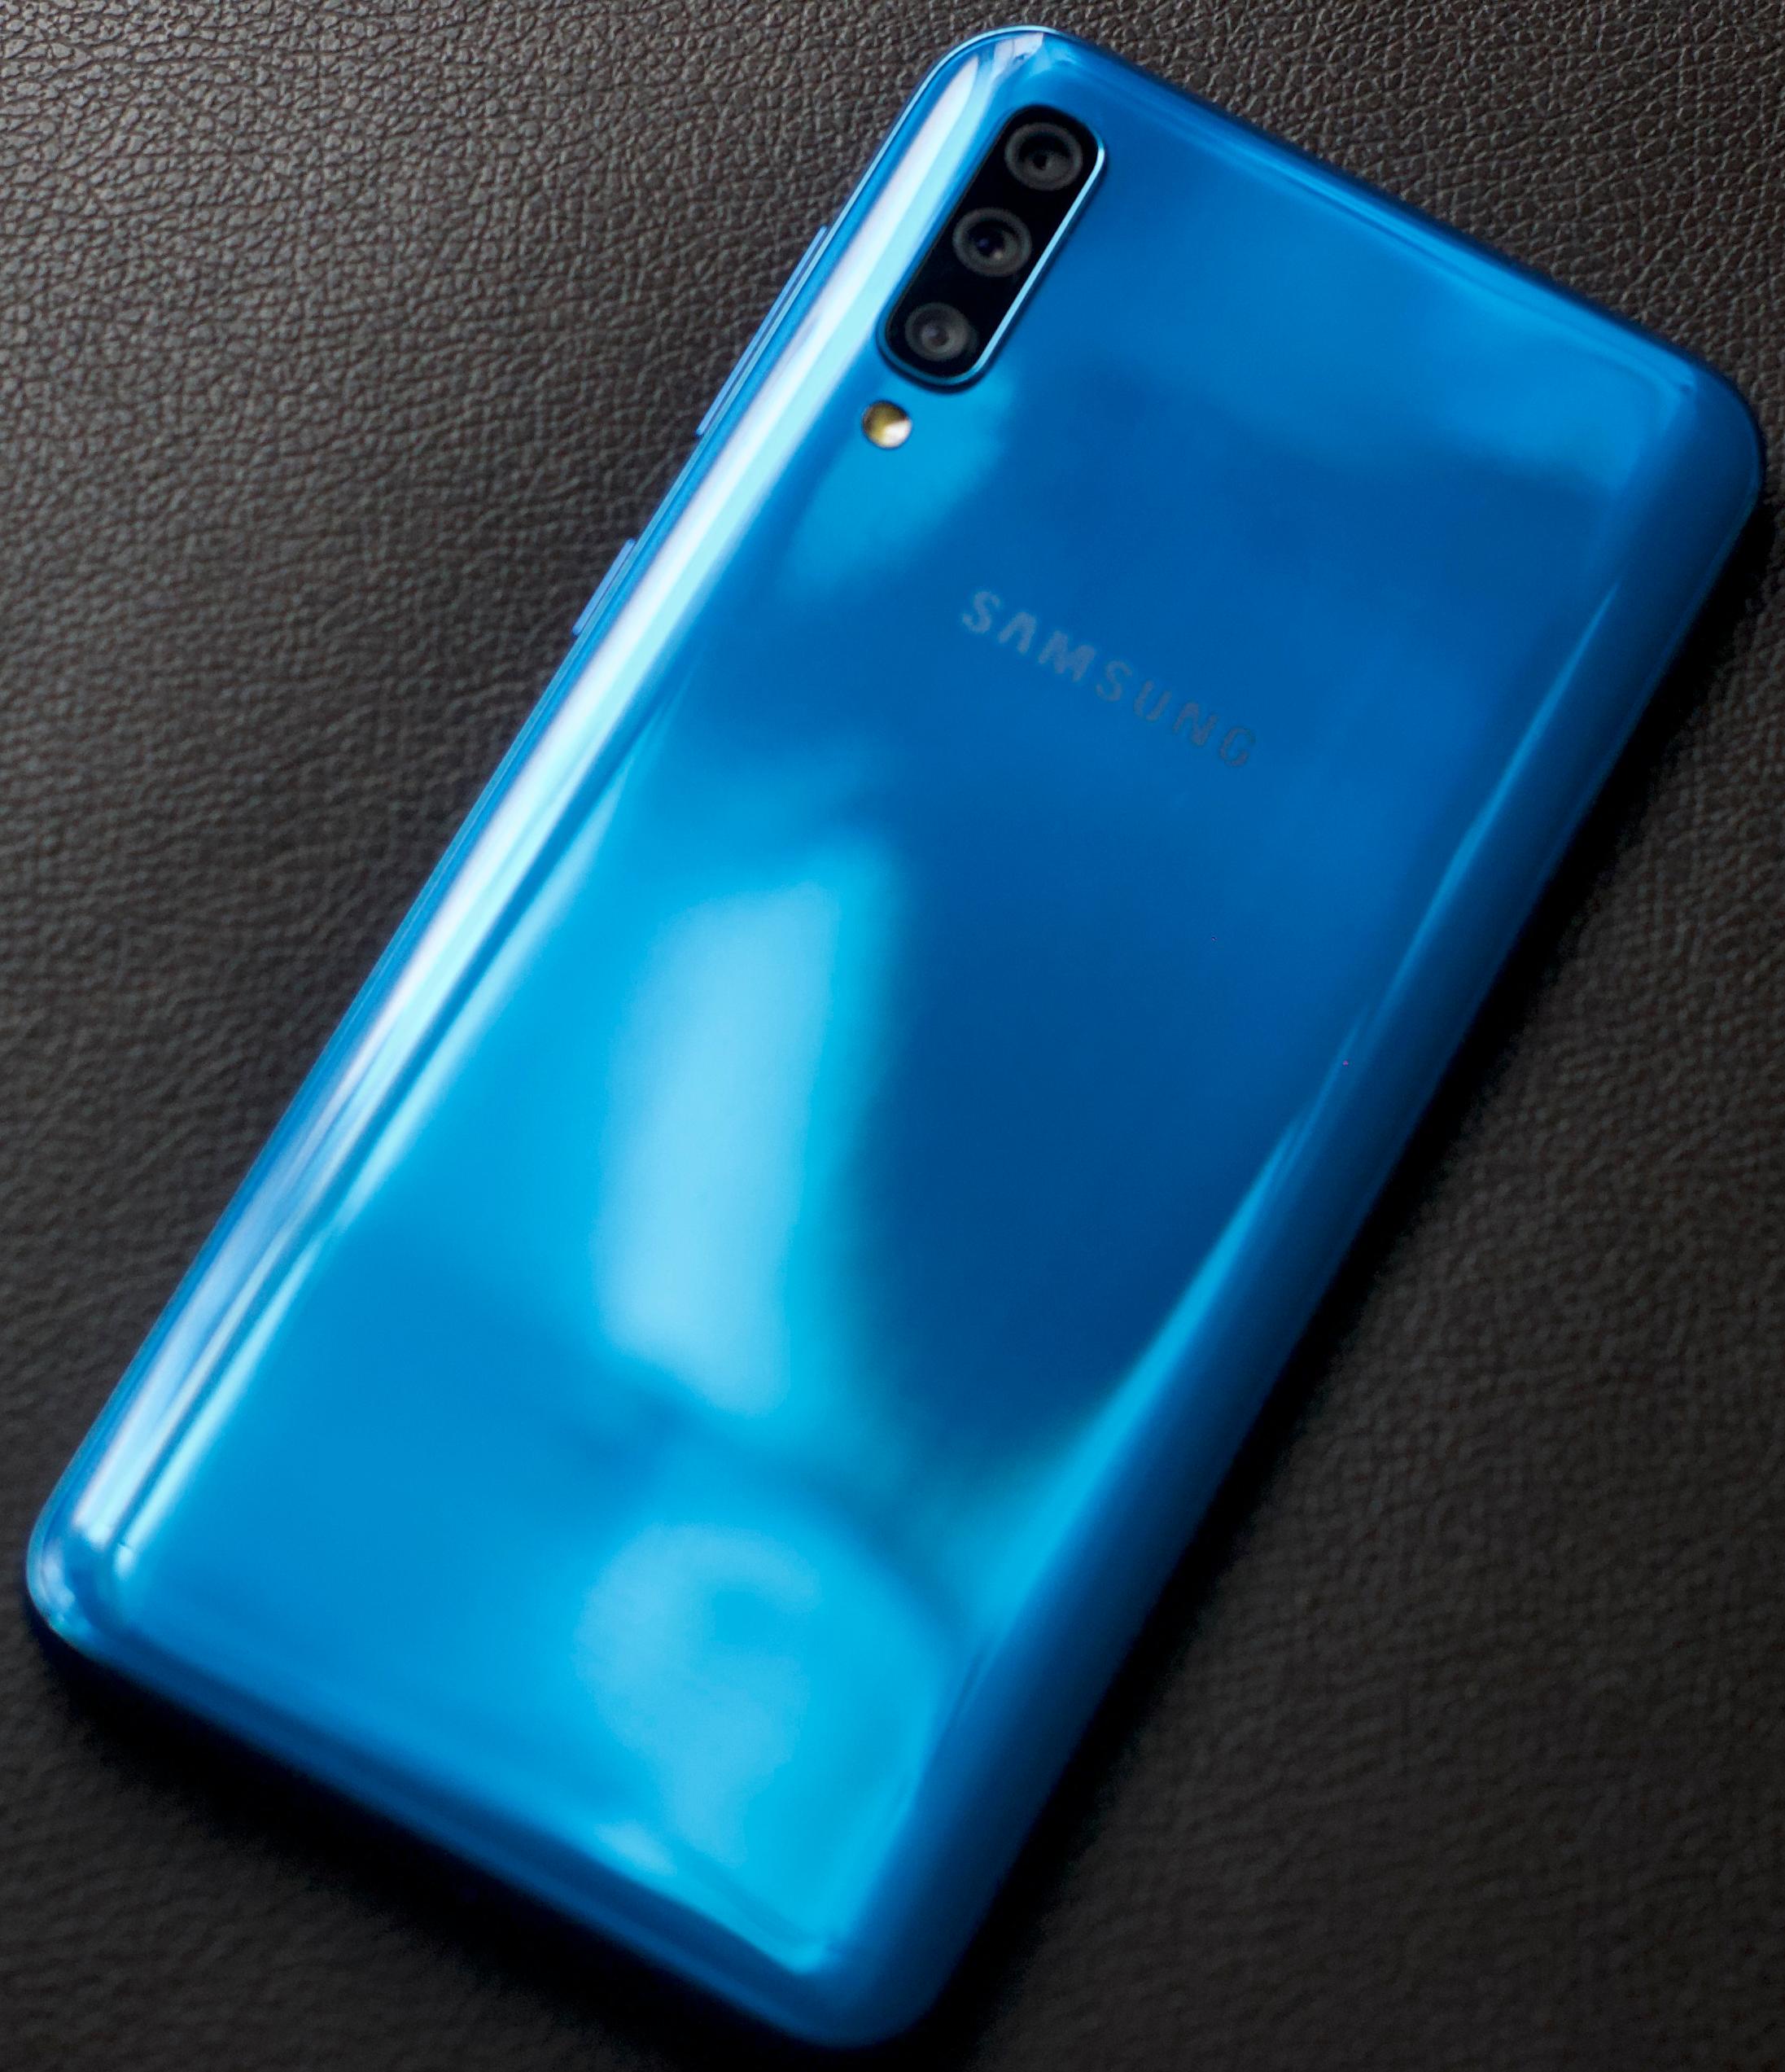 Samsung Galaxy A50 Wikipedia